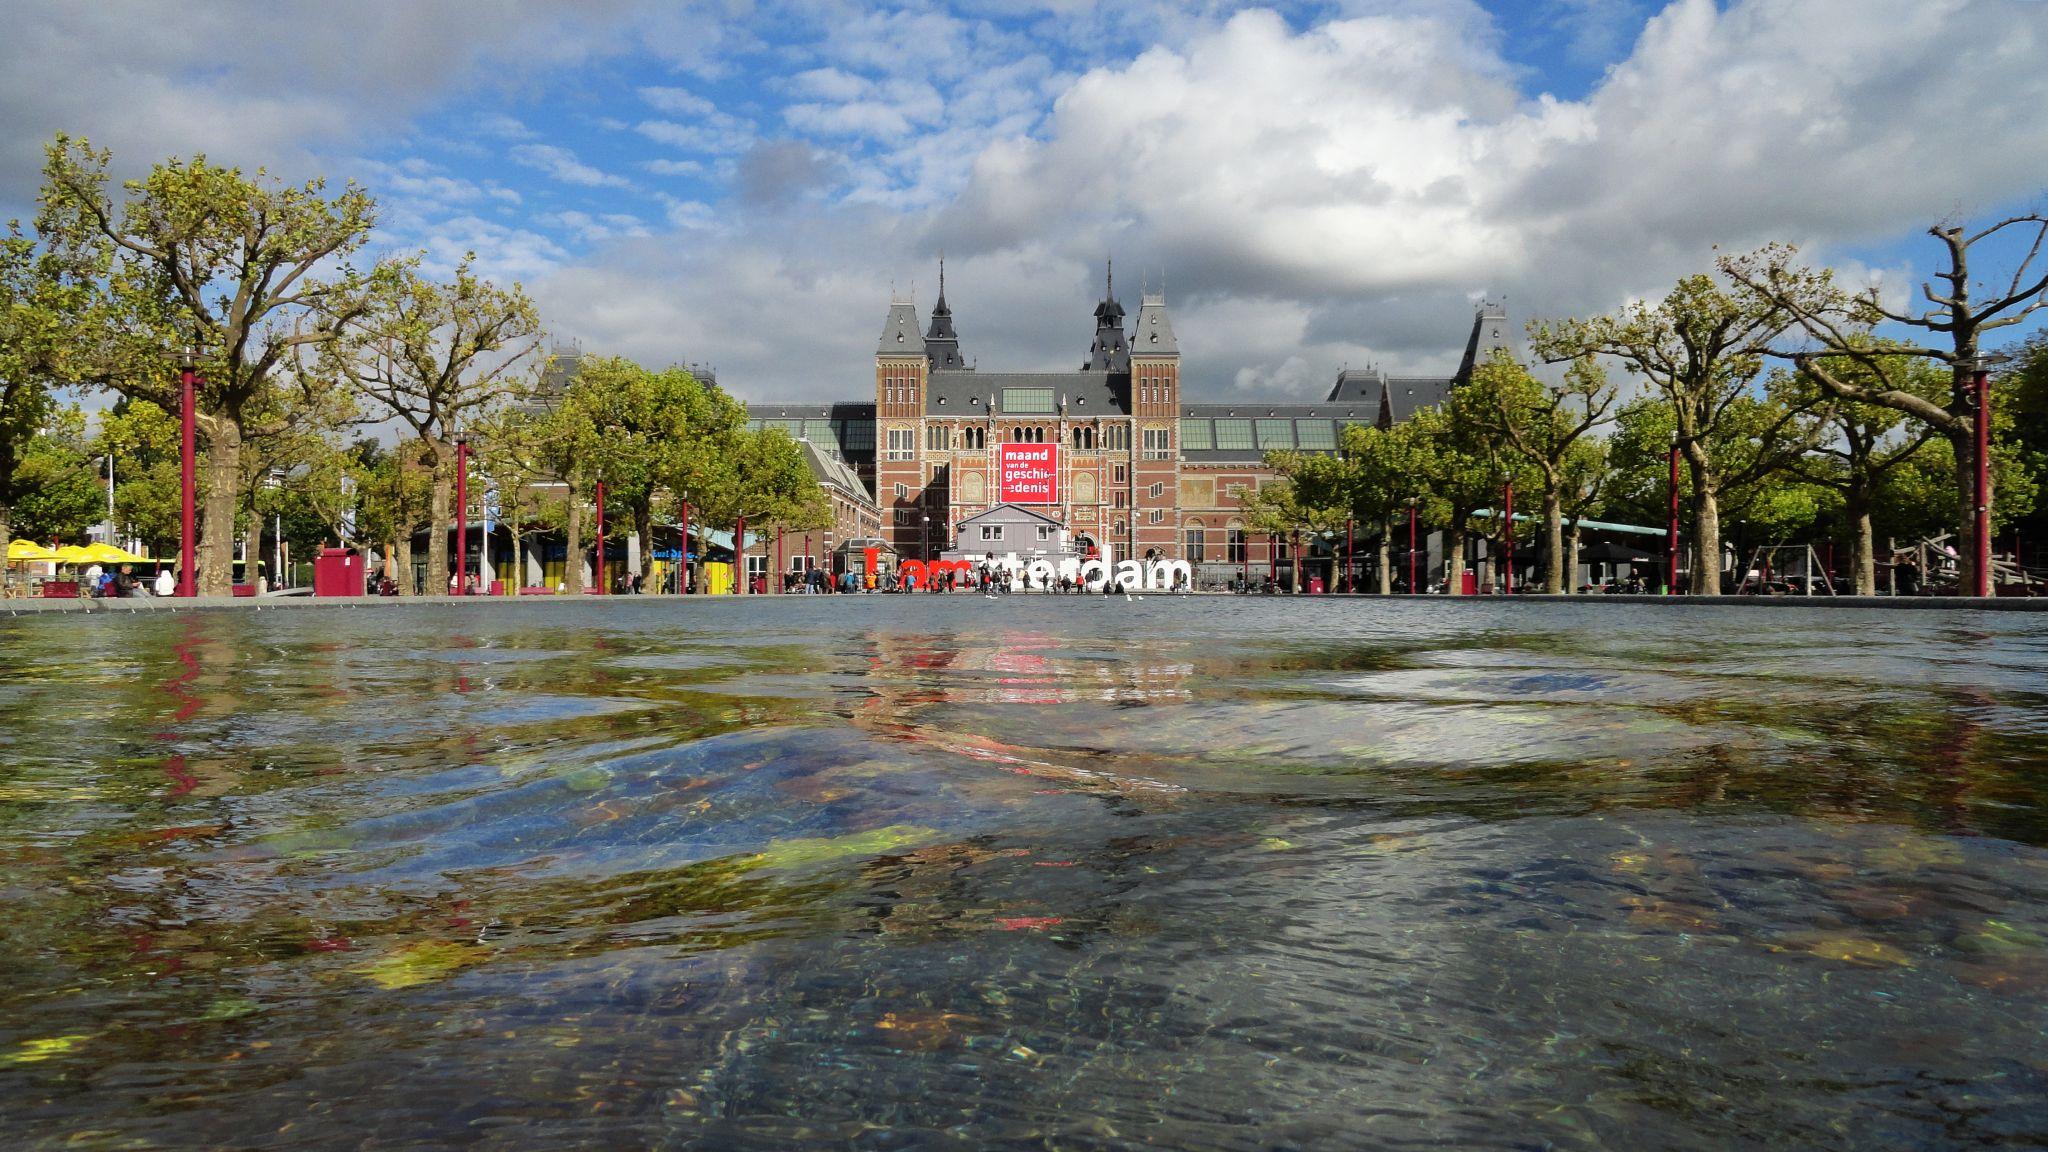 Rijksmuseum Reflecting Pool, Netherlands